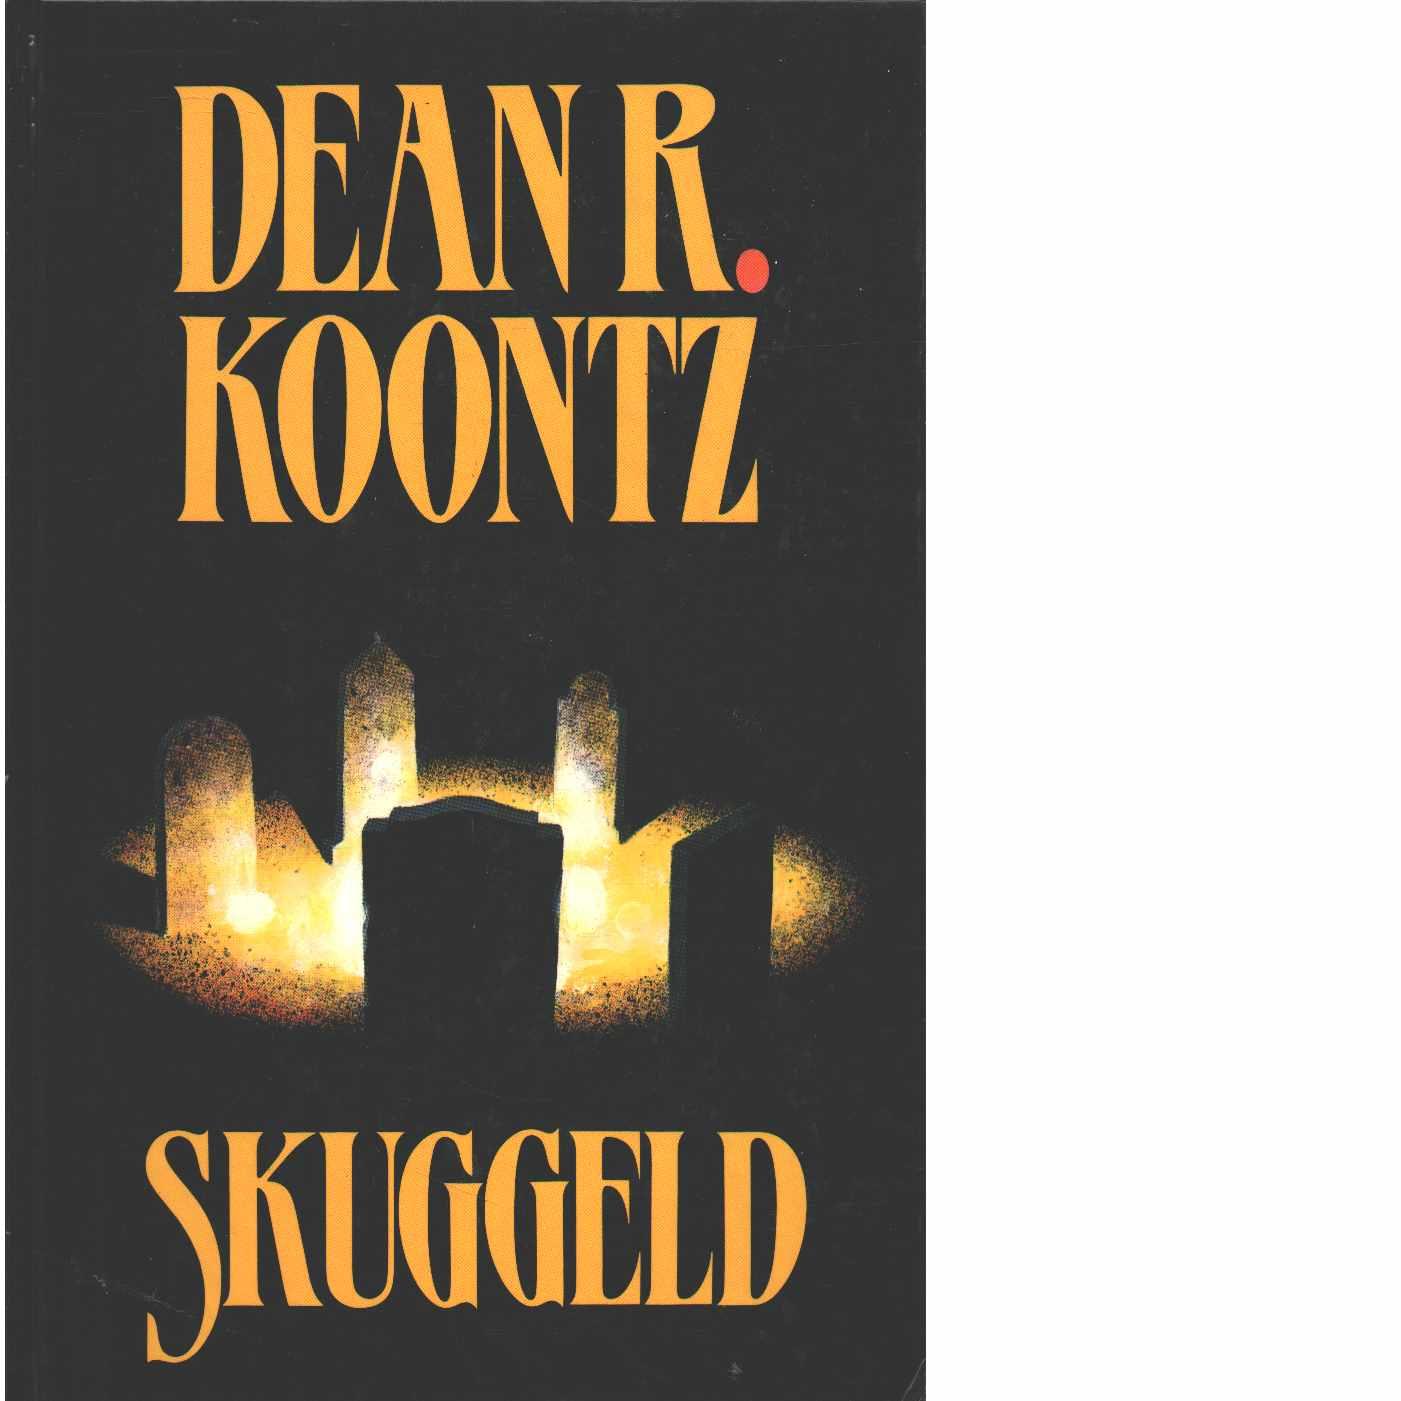 Skuggeld - Koontz, Dean R.